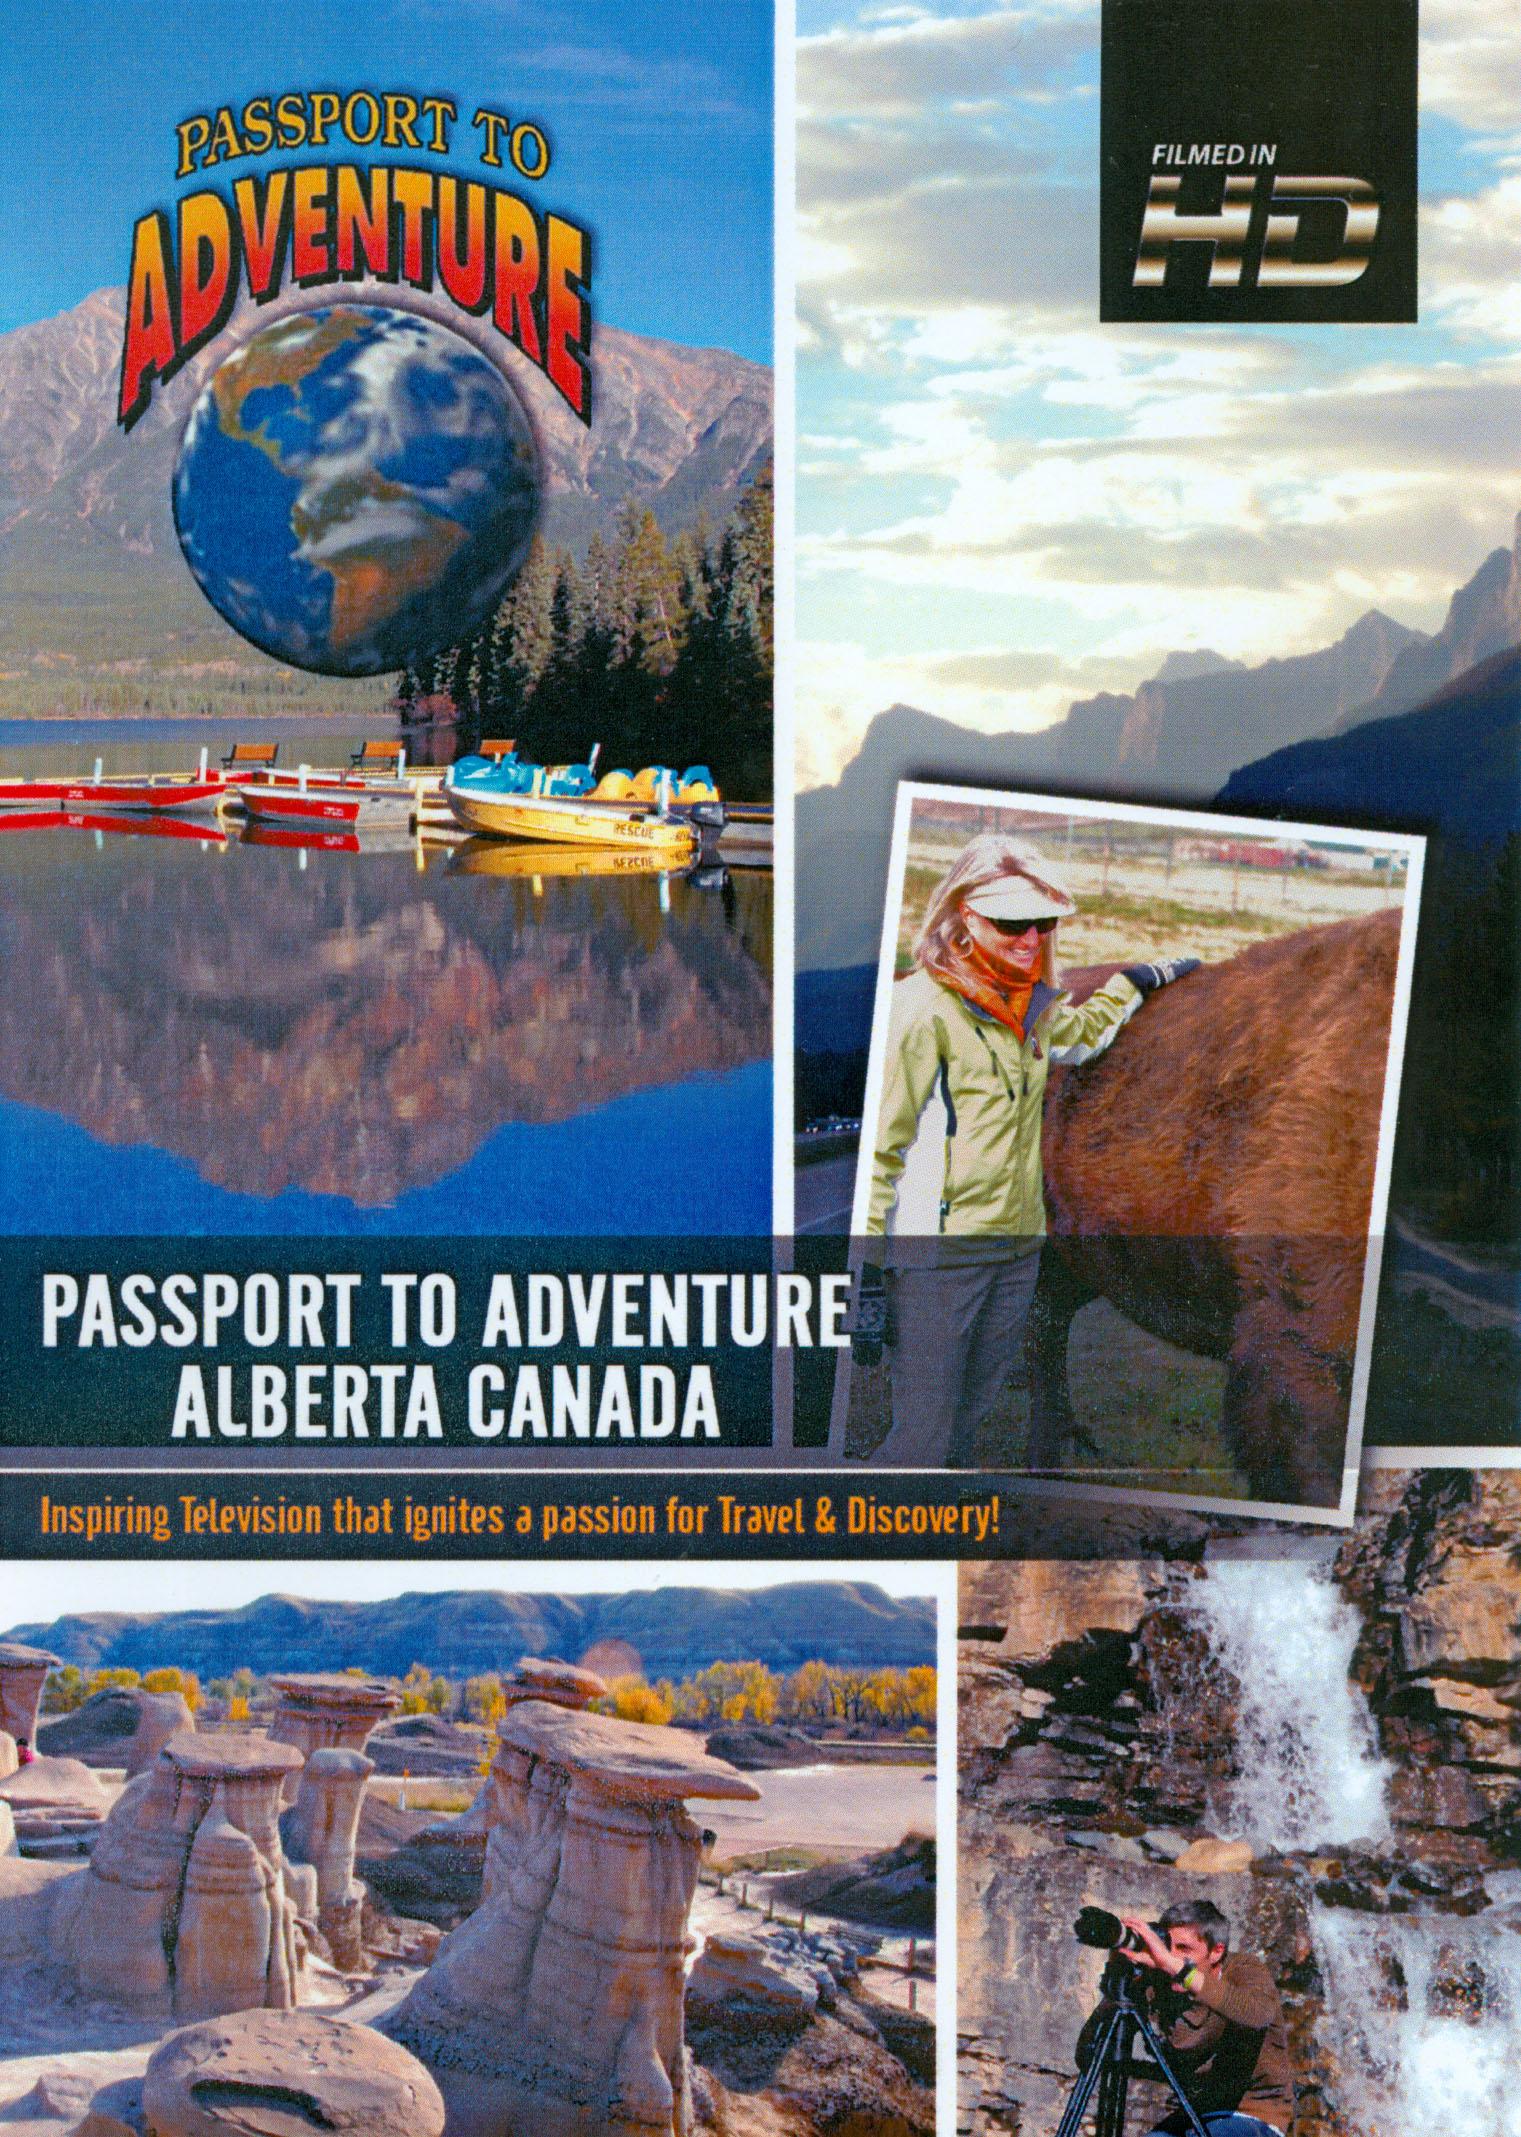 Passport to Adventure: Alberta Canada